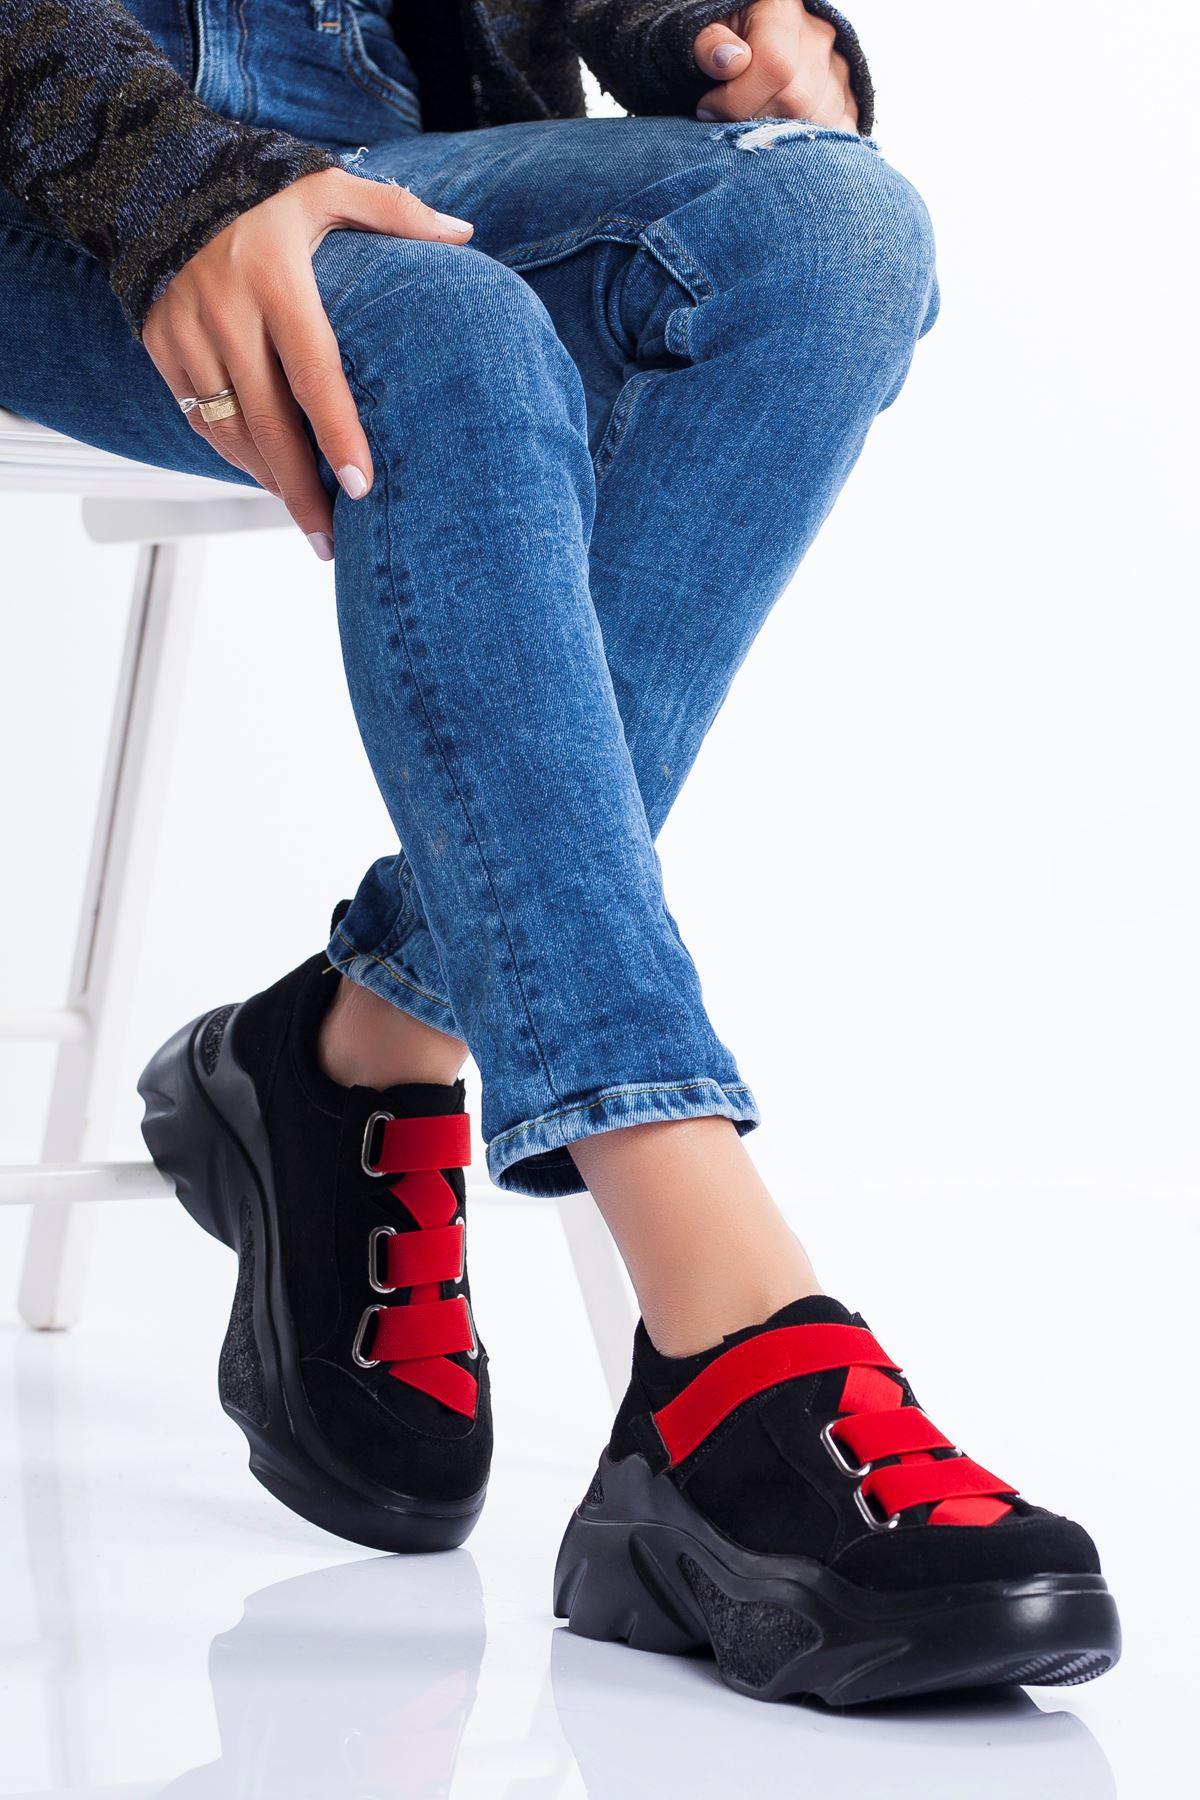 Mita Spor Ayakkabı SİYAH- KIRMIZI